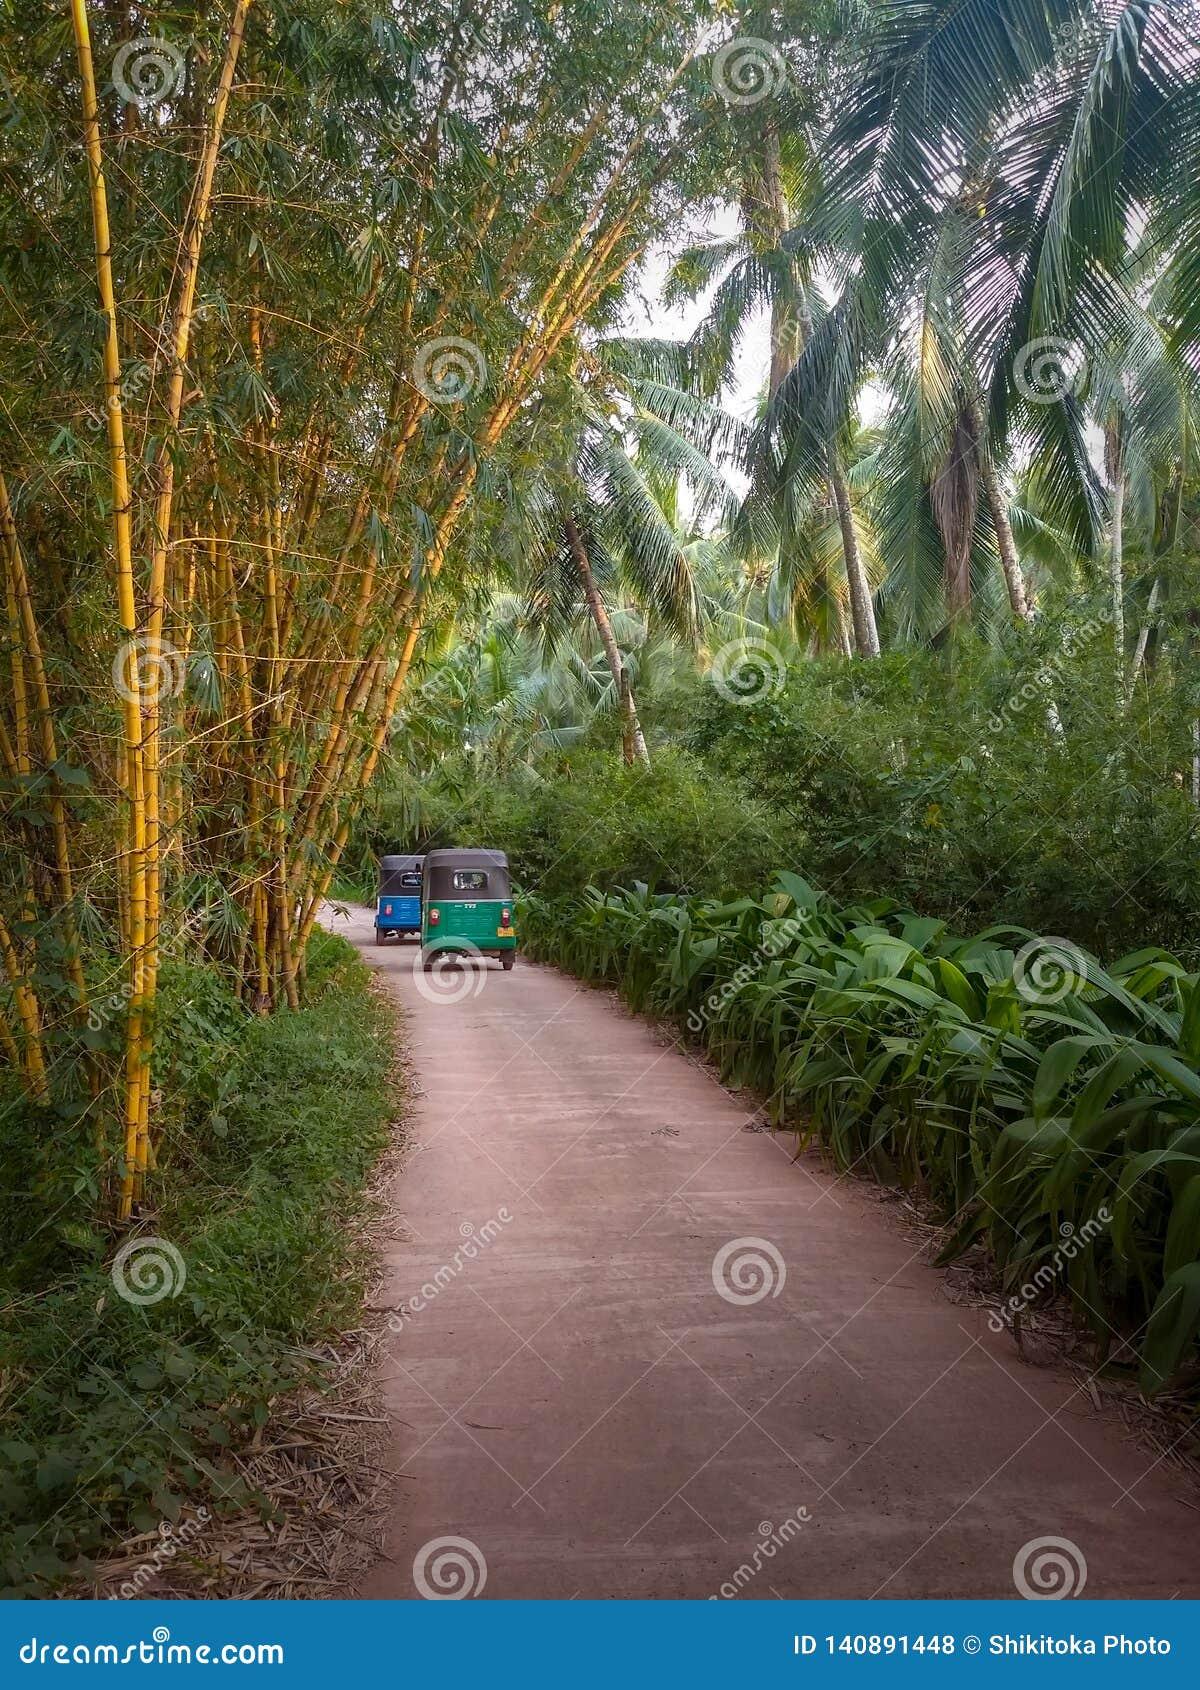 Tuk Tuk in der Bambus- und Palmenut